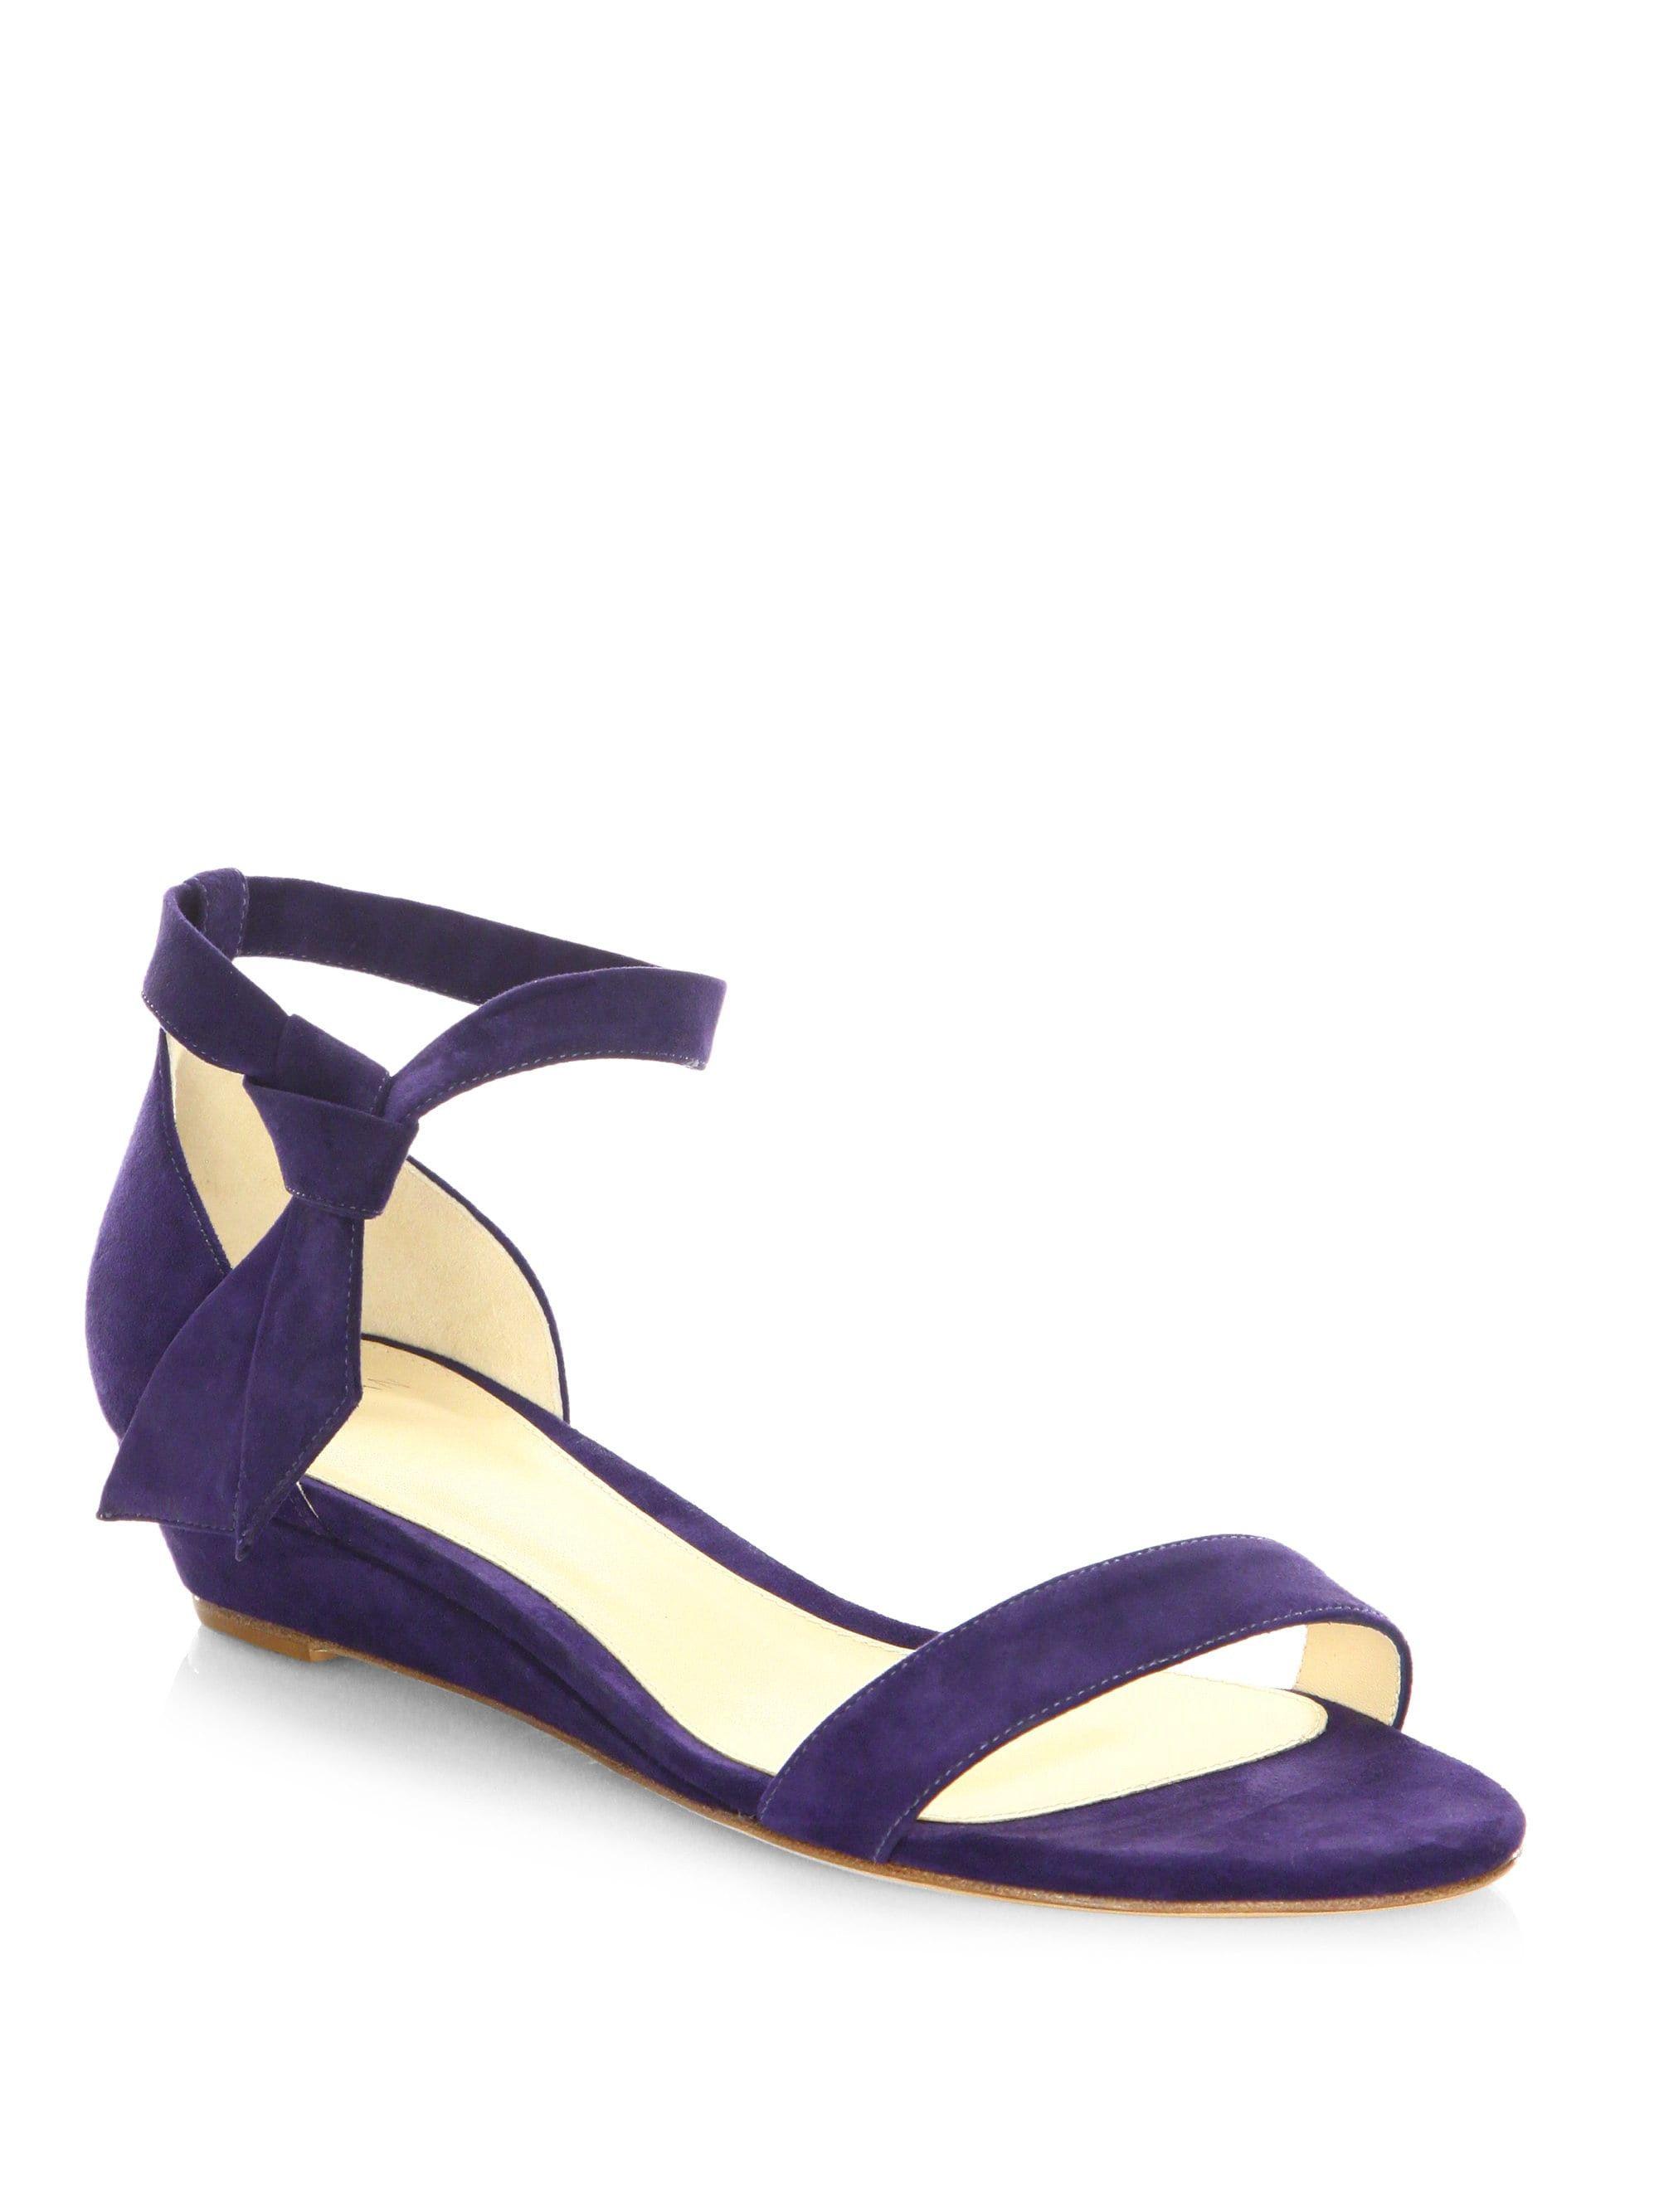 cb0fced9513b Alexandre Birman Clarita Suede Ankle-Tie Demi-Wedge Sandals - Bali 7.5